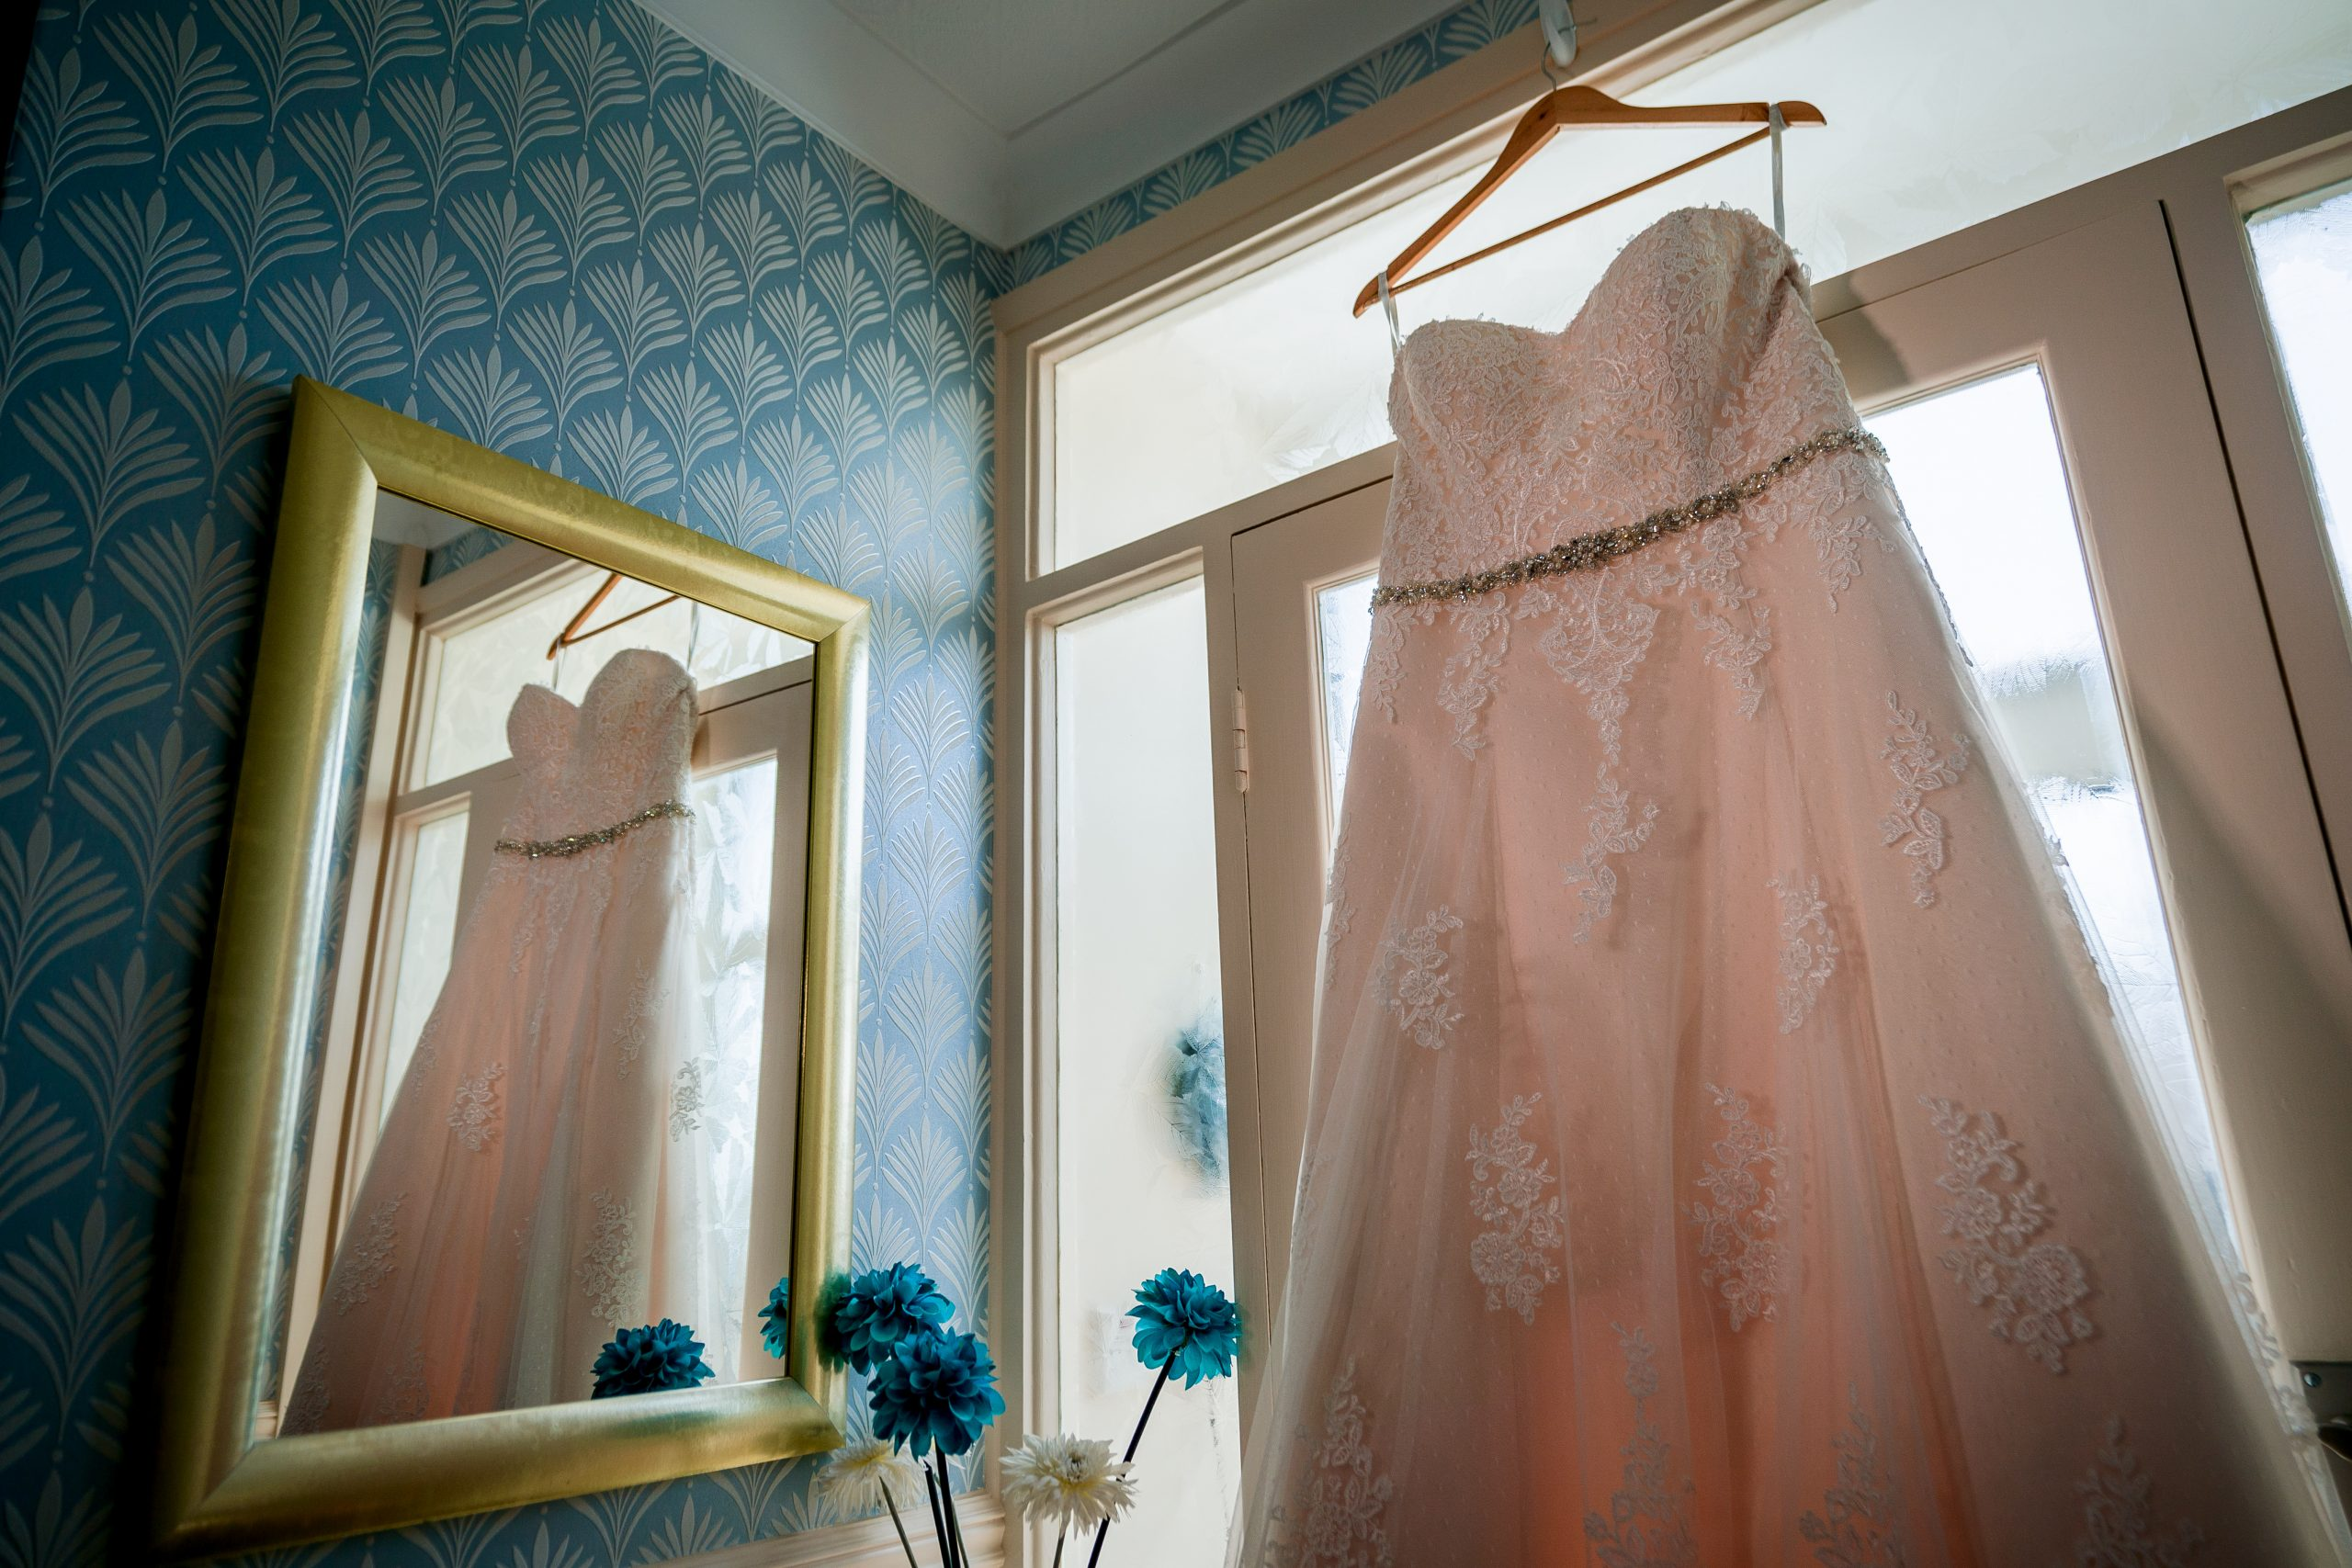 Choosing the Bride's Wedding Dress